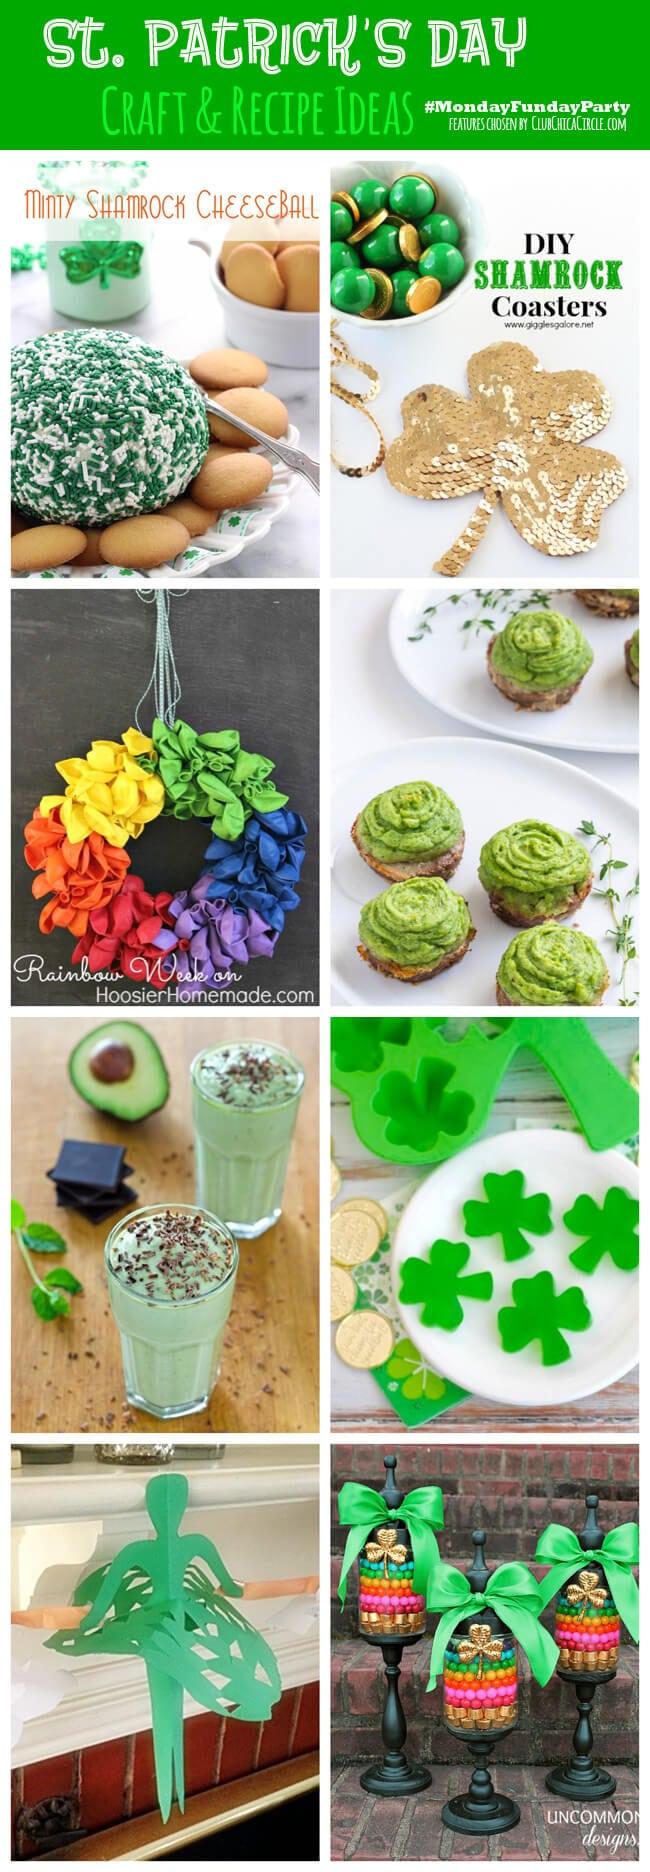 8 St. Patricks Day Crafts & Recipes